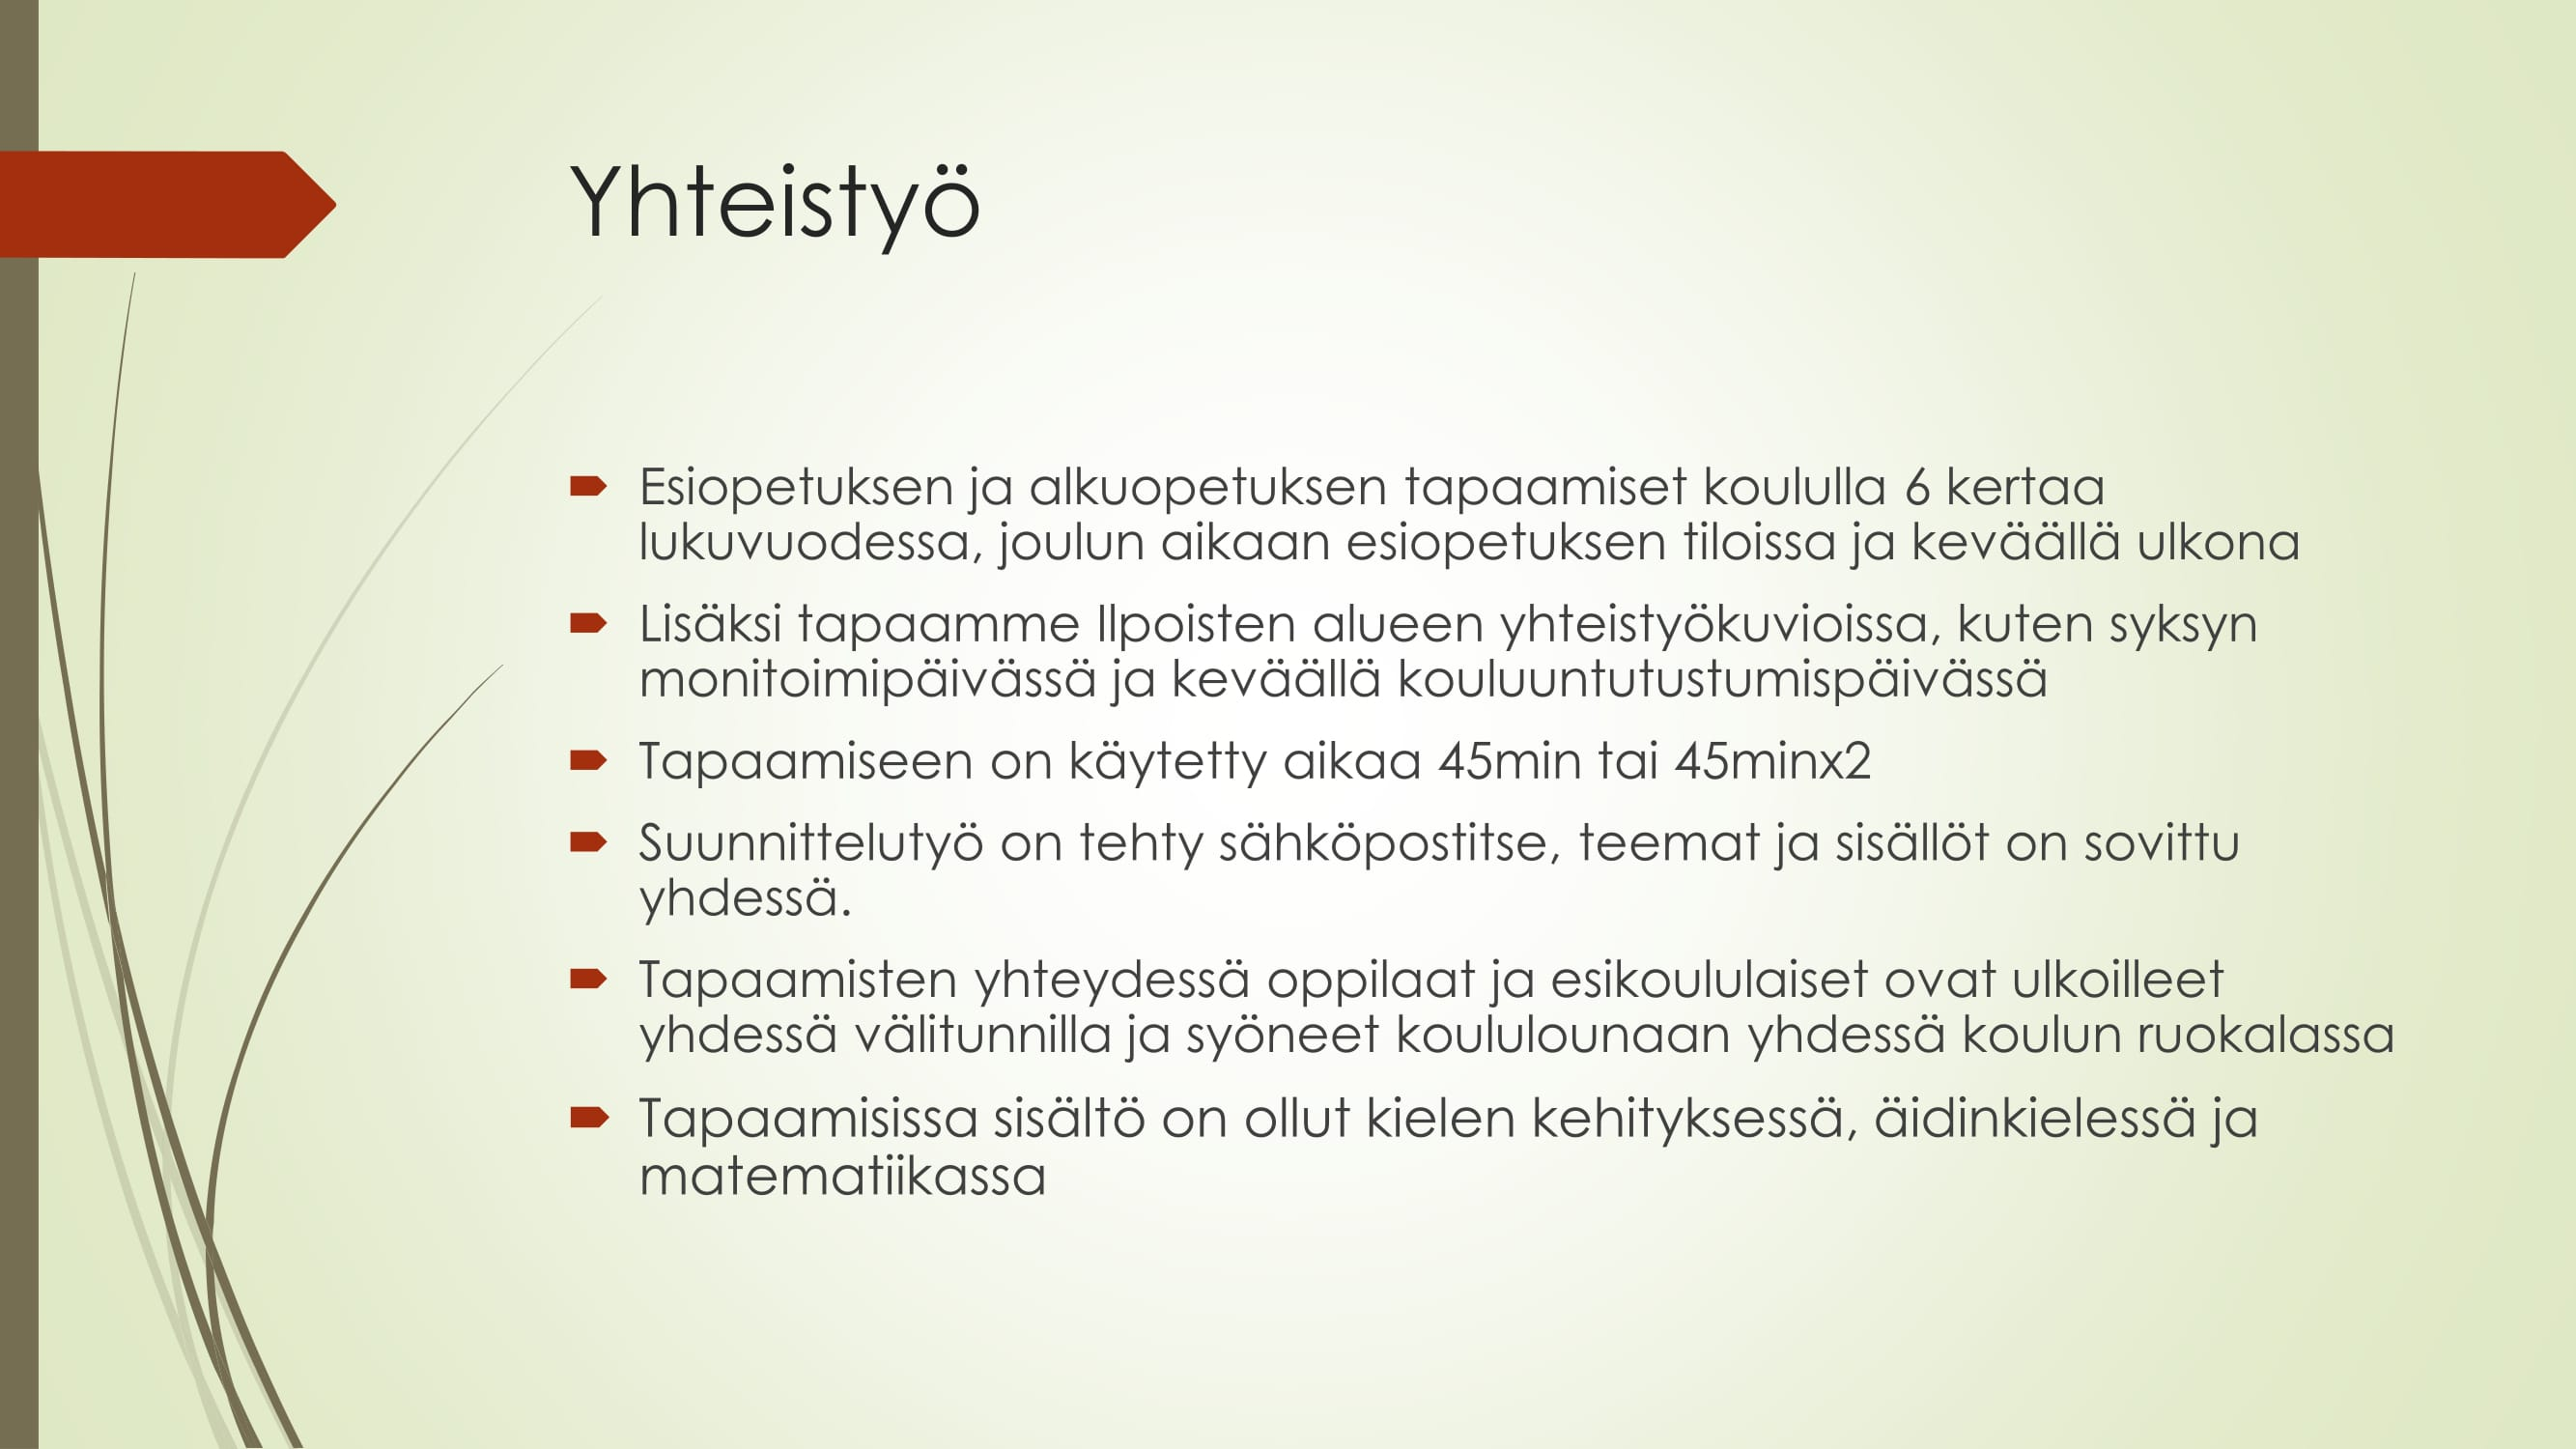 esi-alku-akt-2